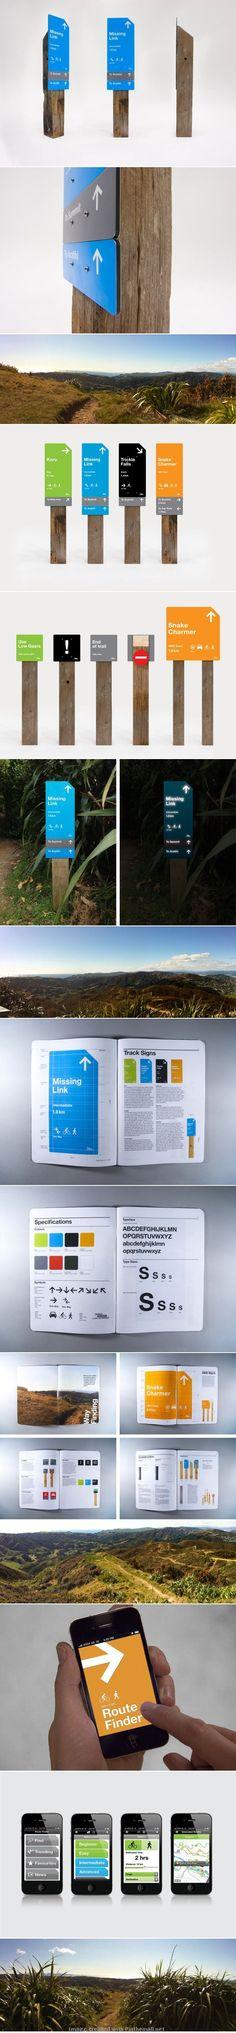 Makara Peak mountain bike trails wayfinding system, via Behance.: